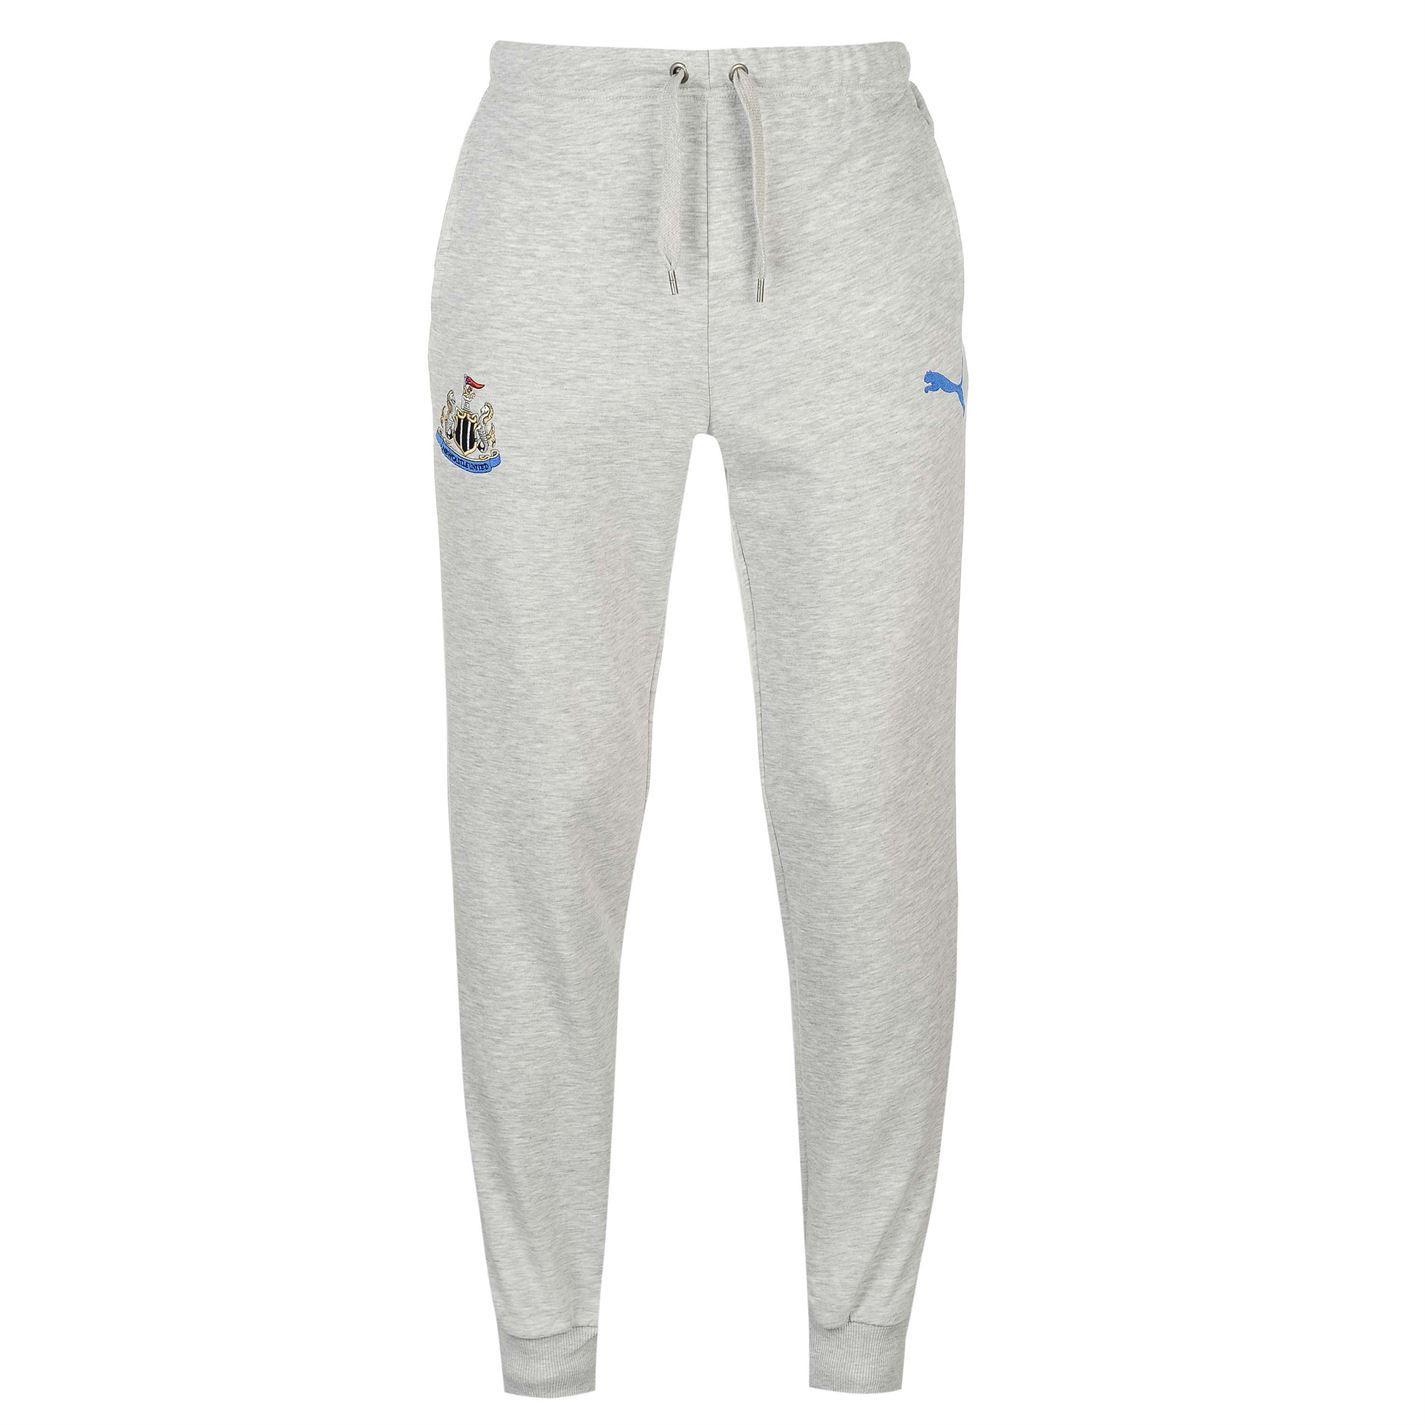 ebfff7960a48 ... Puma Newcastle United Sweat Track Pants Mens Grey Football Soccer Sweat  Bottoms ...